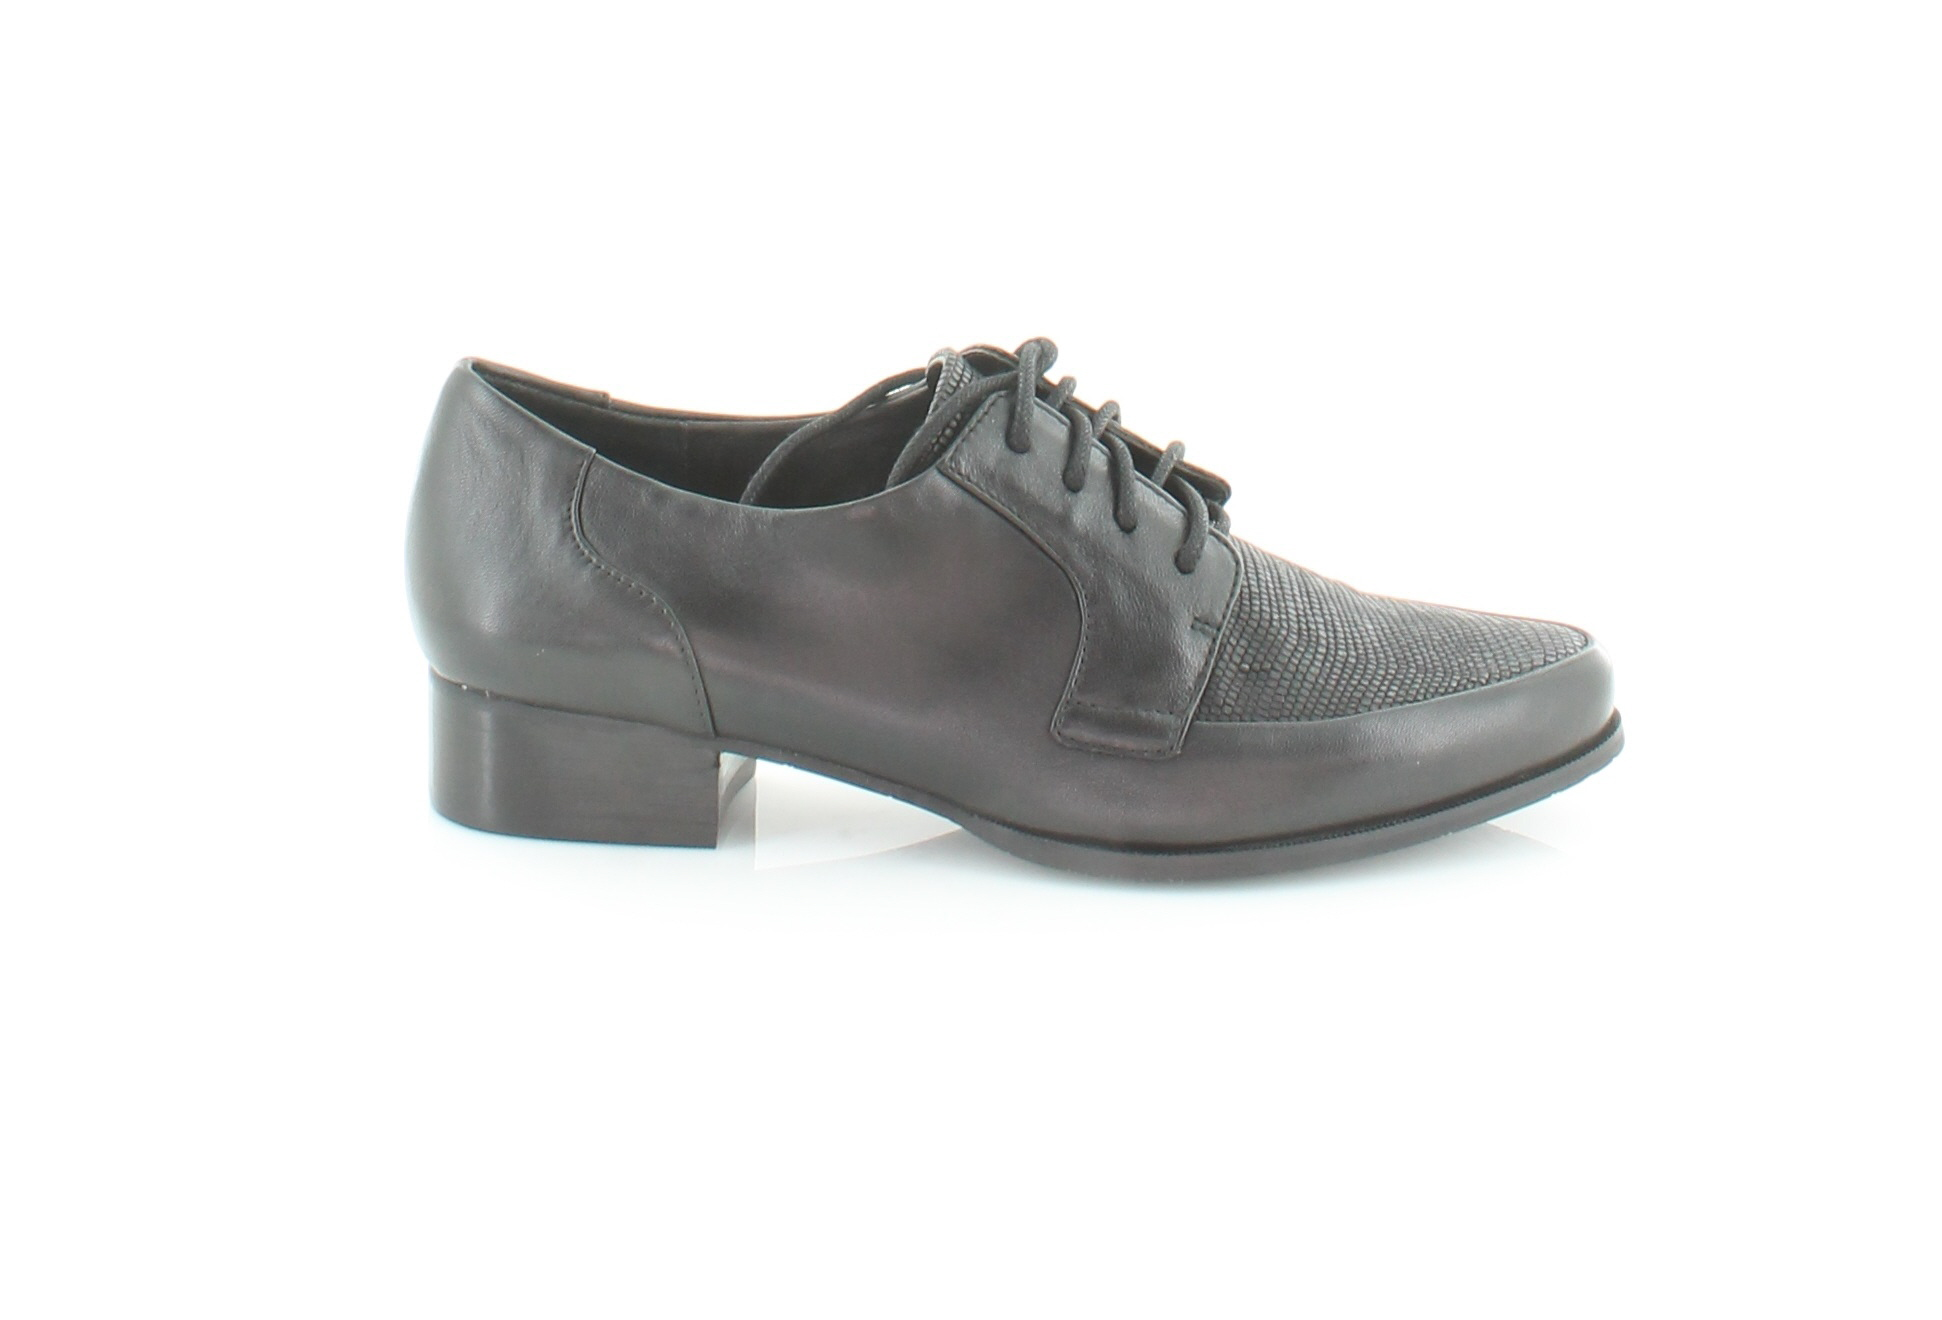 Tahari New Leeza Black Womens Shoes Size 6 M Heels MSRP $89